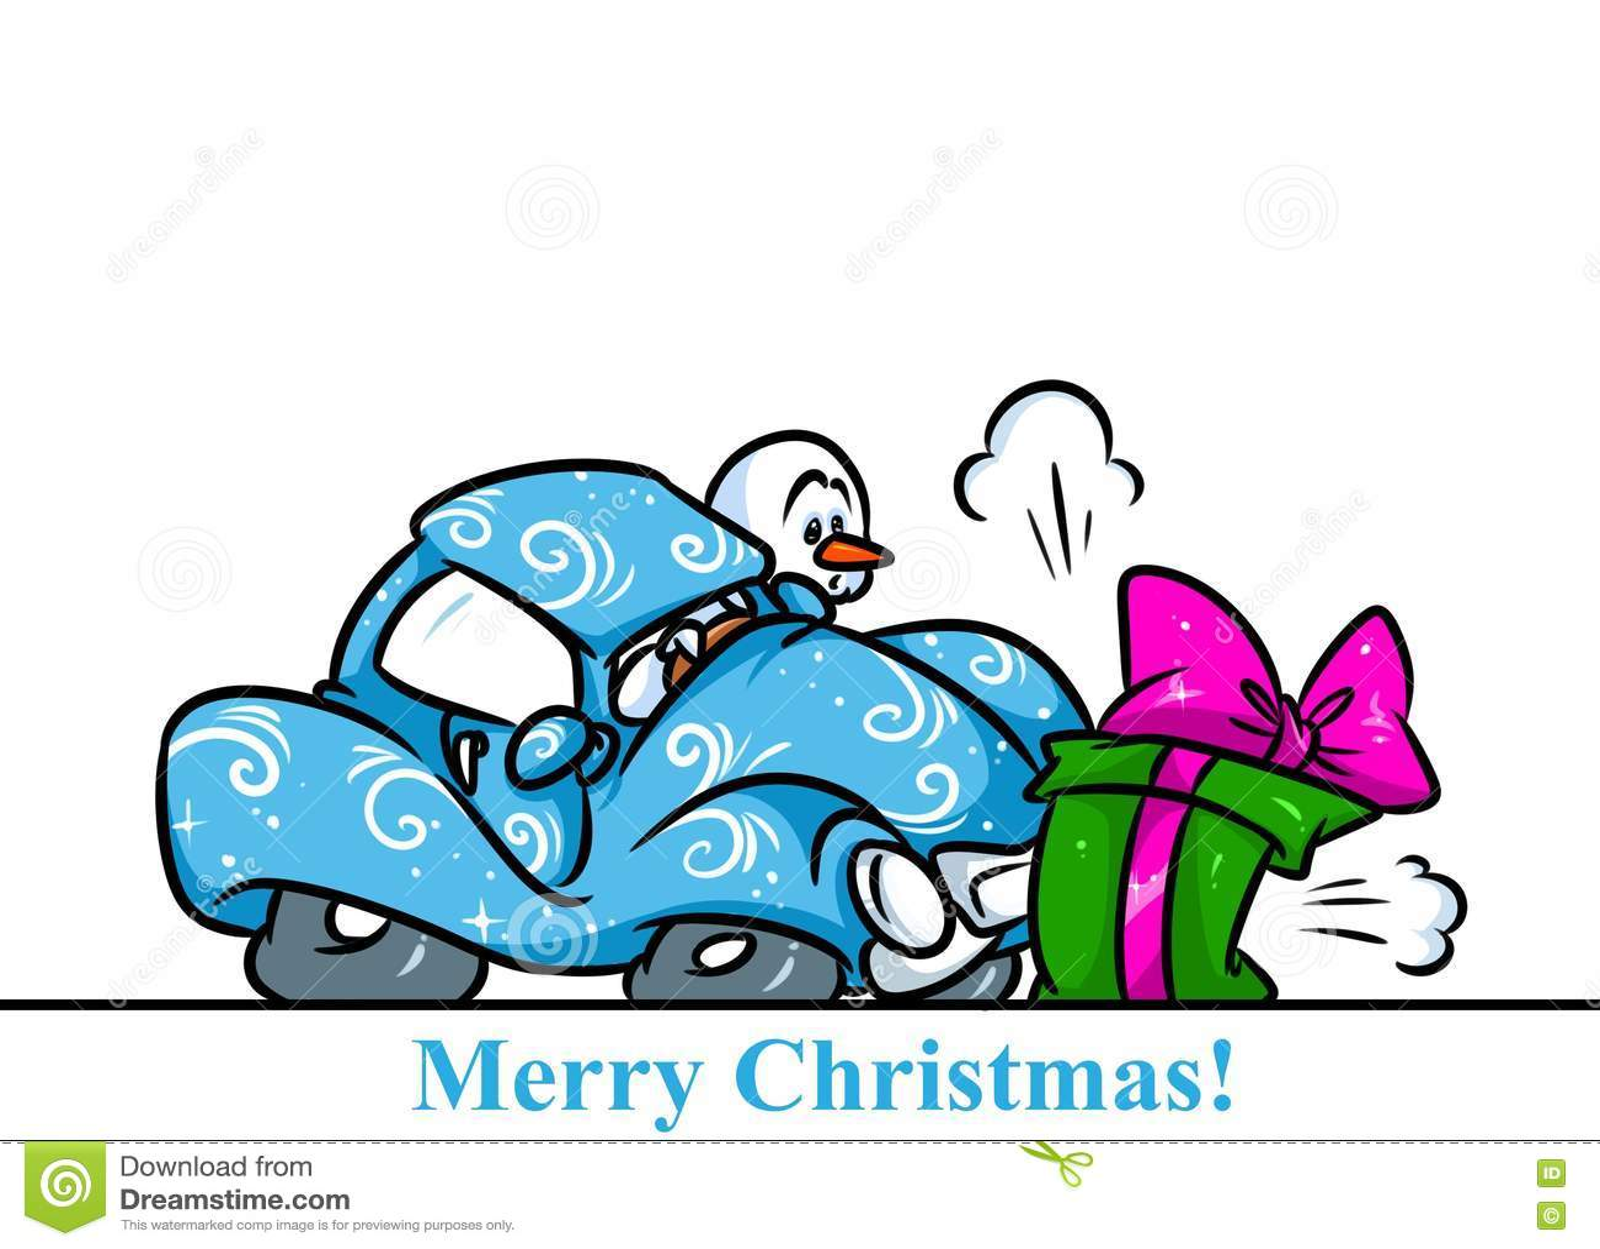 Christmas Snowman Character Car Accident Gift Cartoon Stock